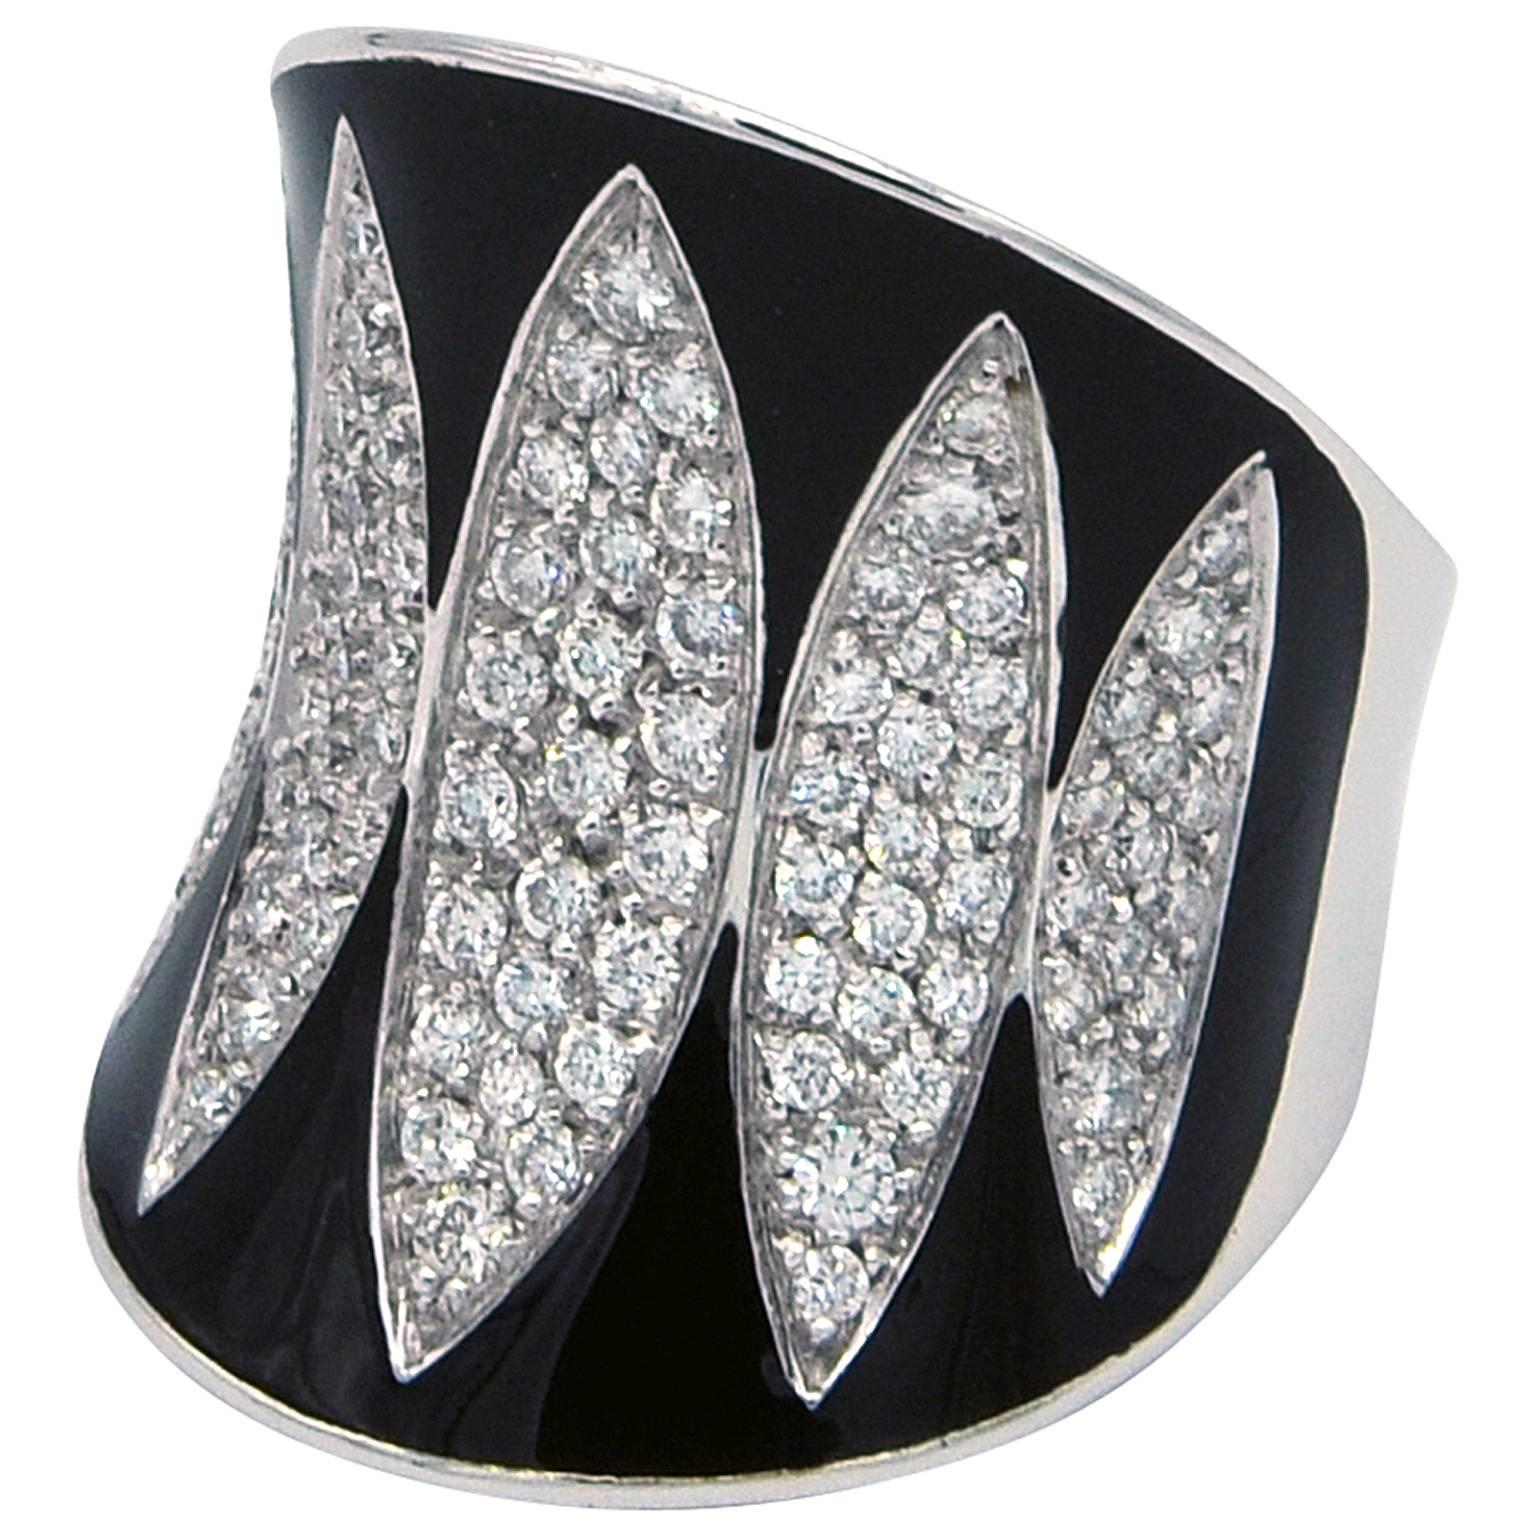 Enamel and Diamonds White Gold Ring